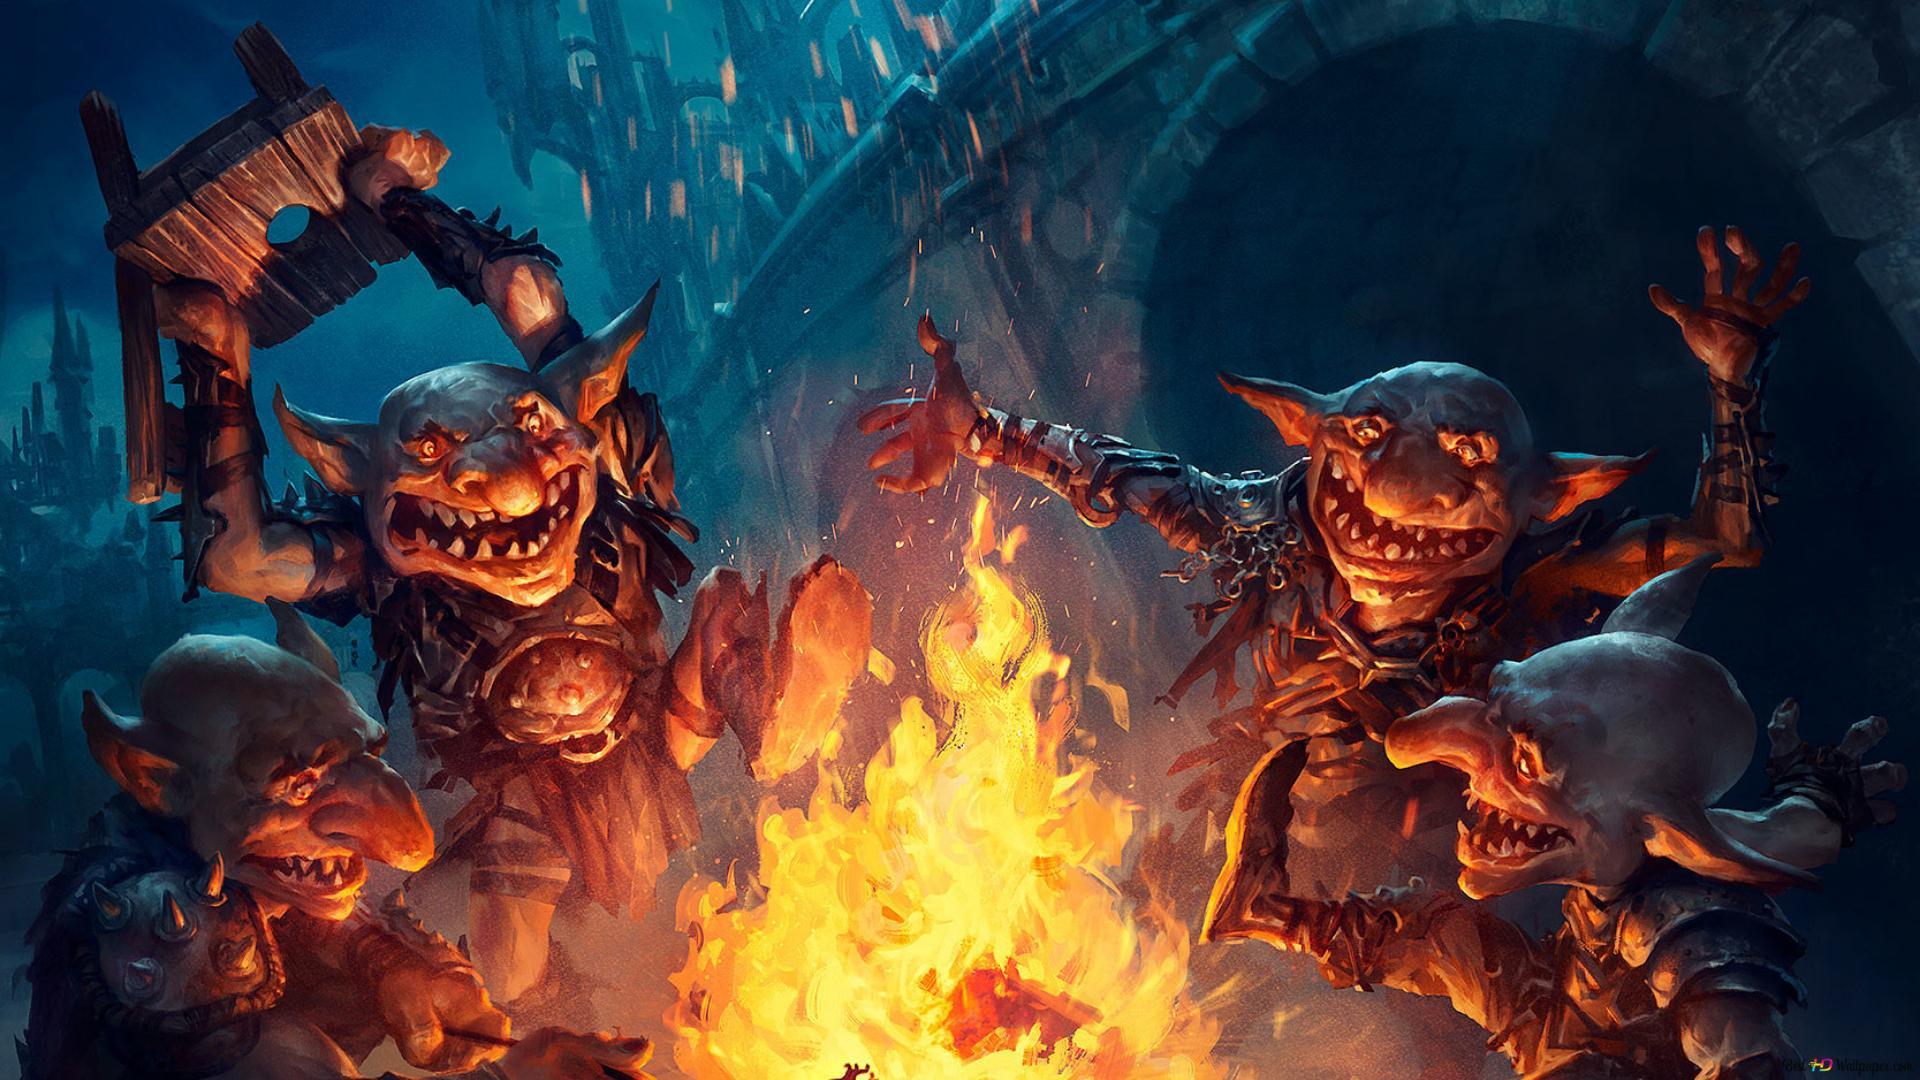 Magic The Gathering Goblin Gathering Hd Wallpaper Download